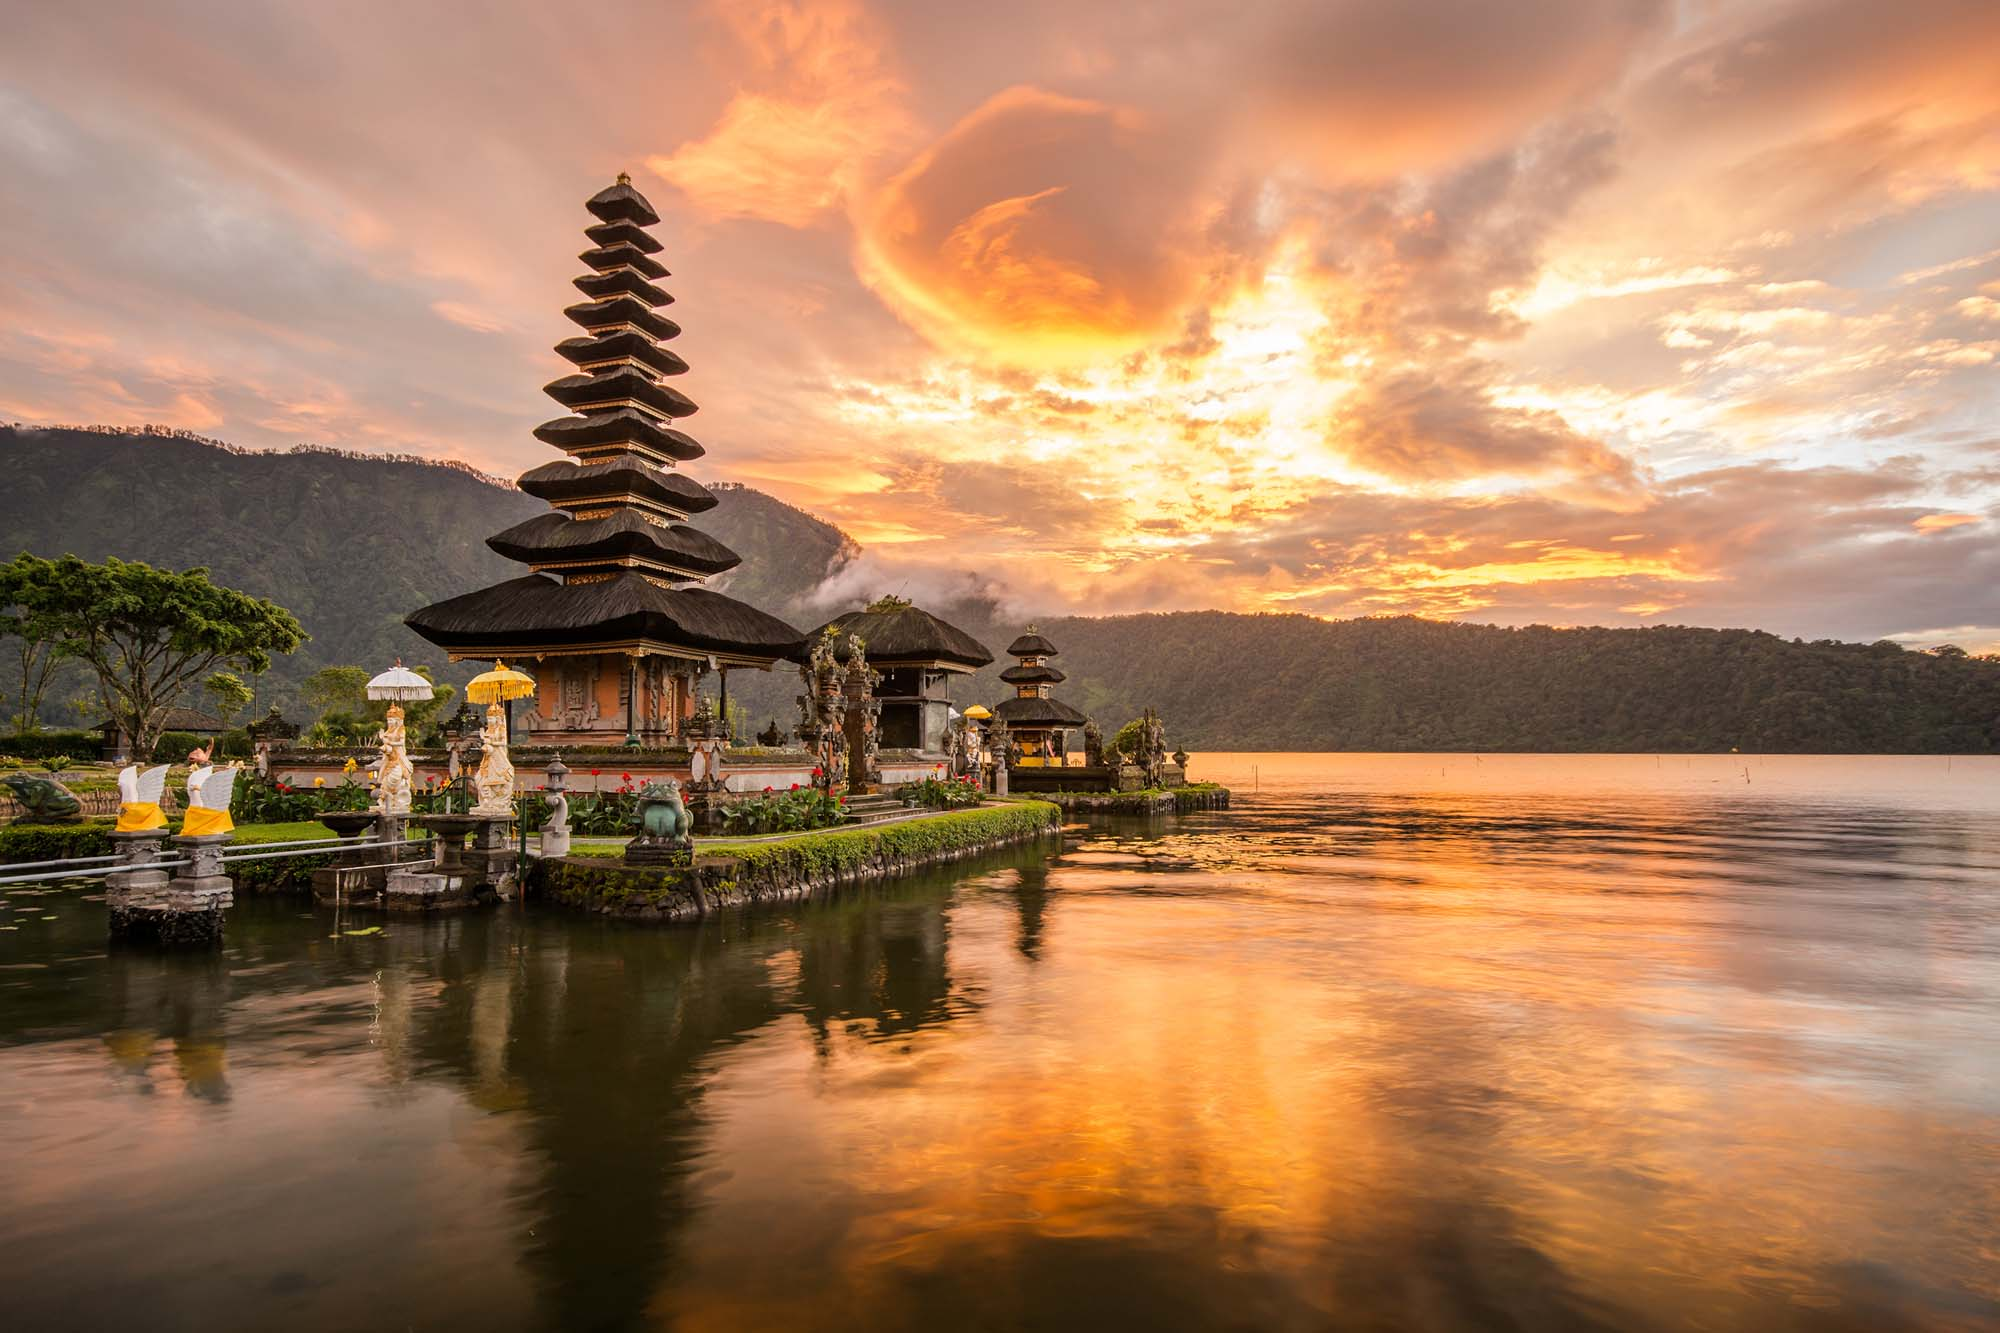 Bali eid summer travel destinations